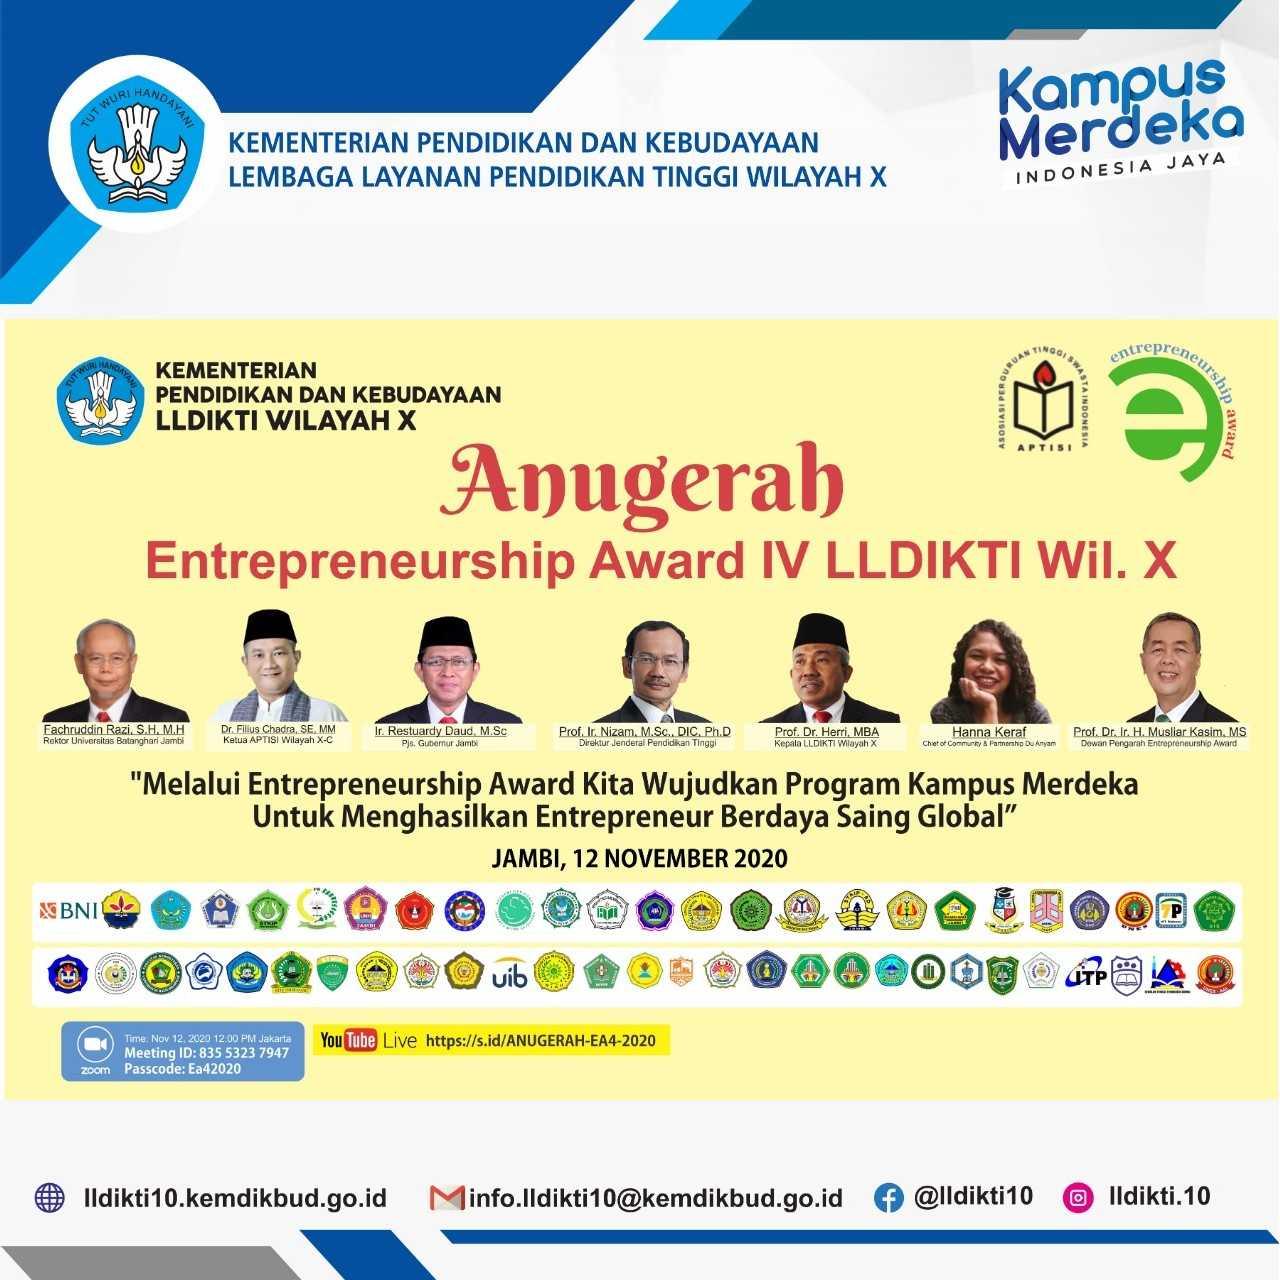 Anugerah Entrepreneurship Award IV  LLDIKTI Wilayah X Tahun 2020